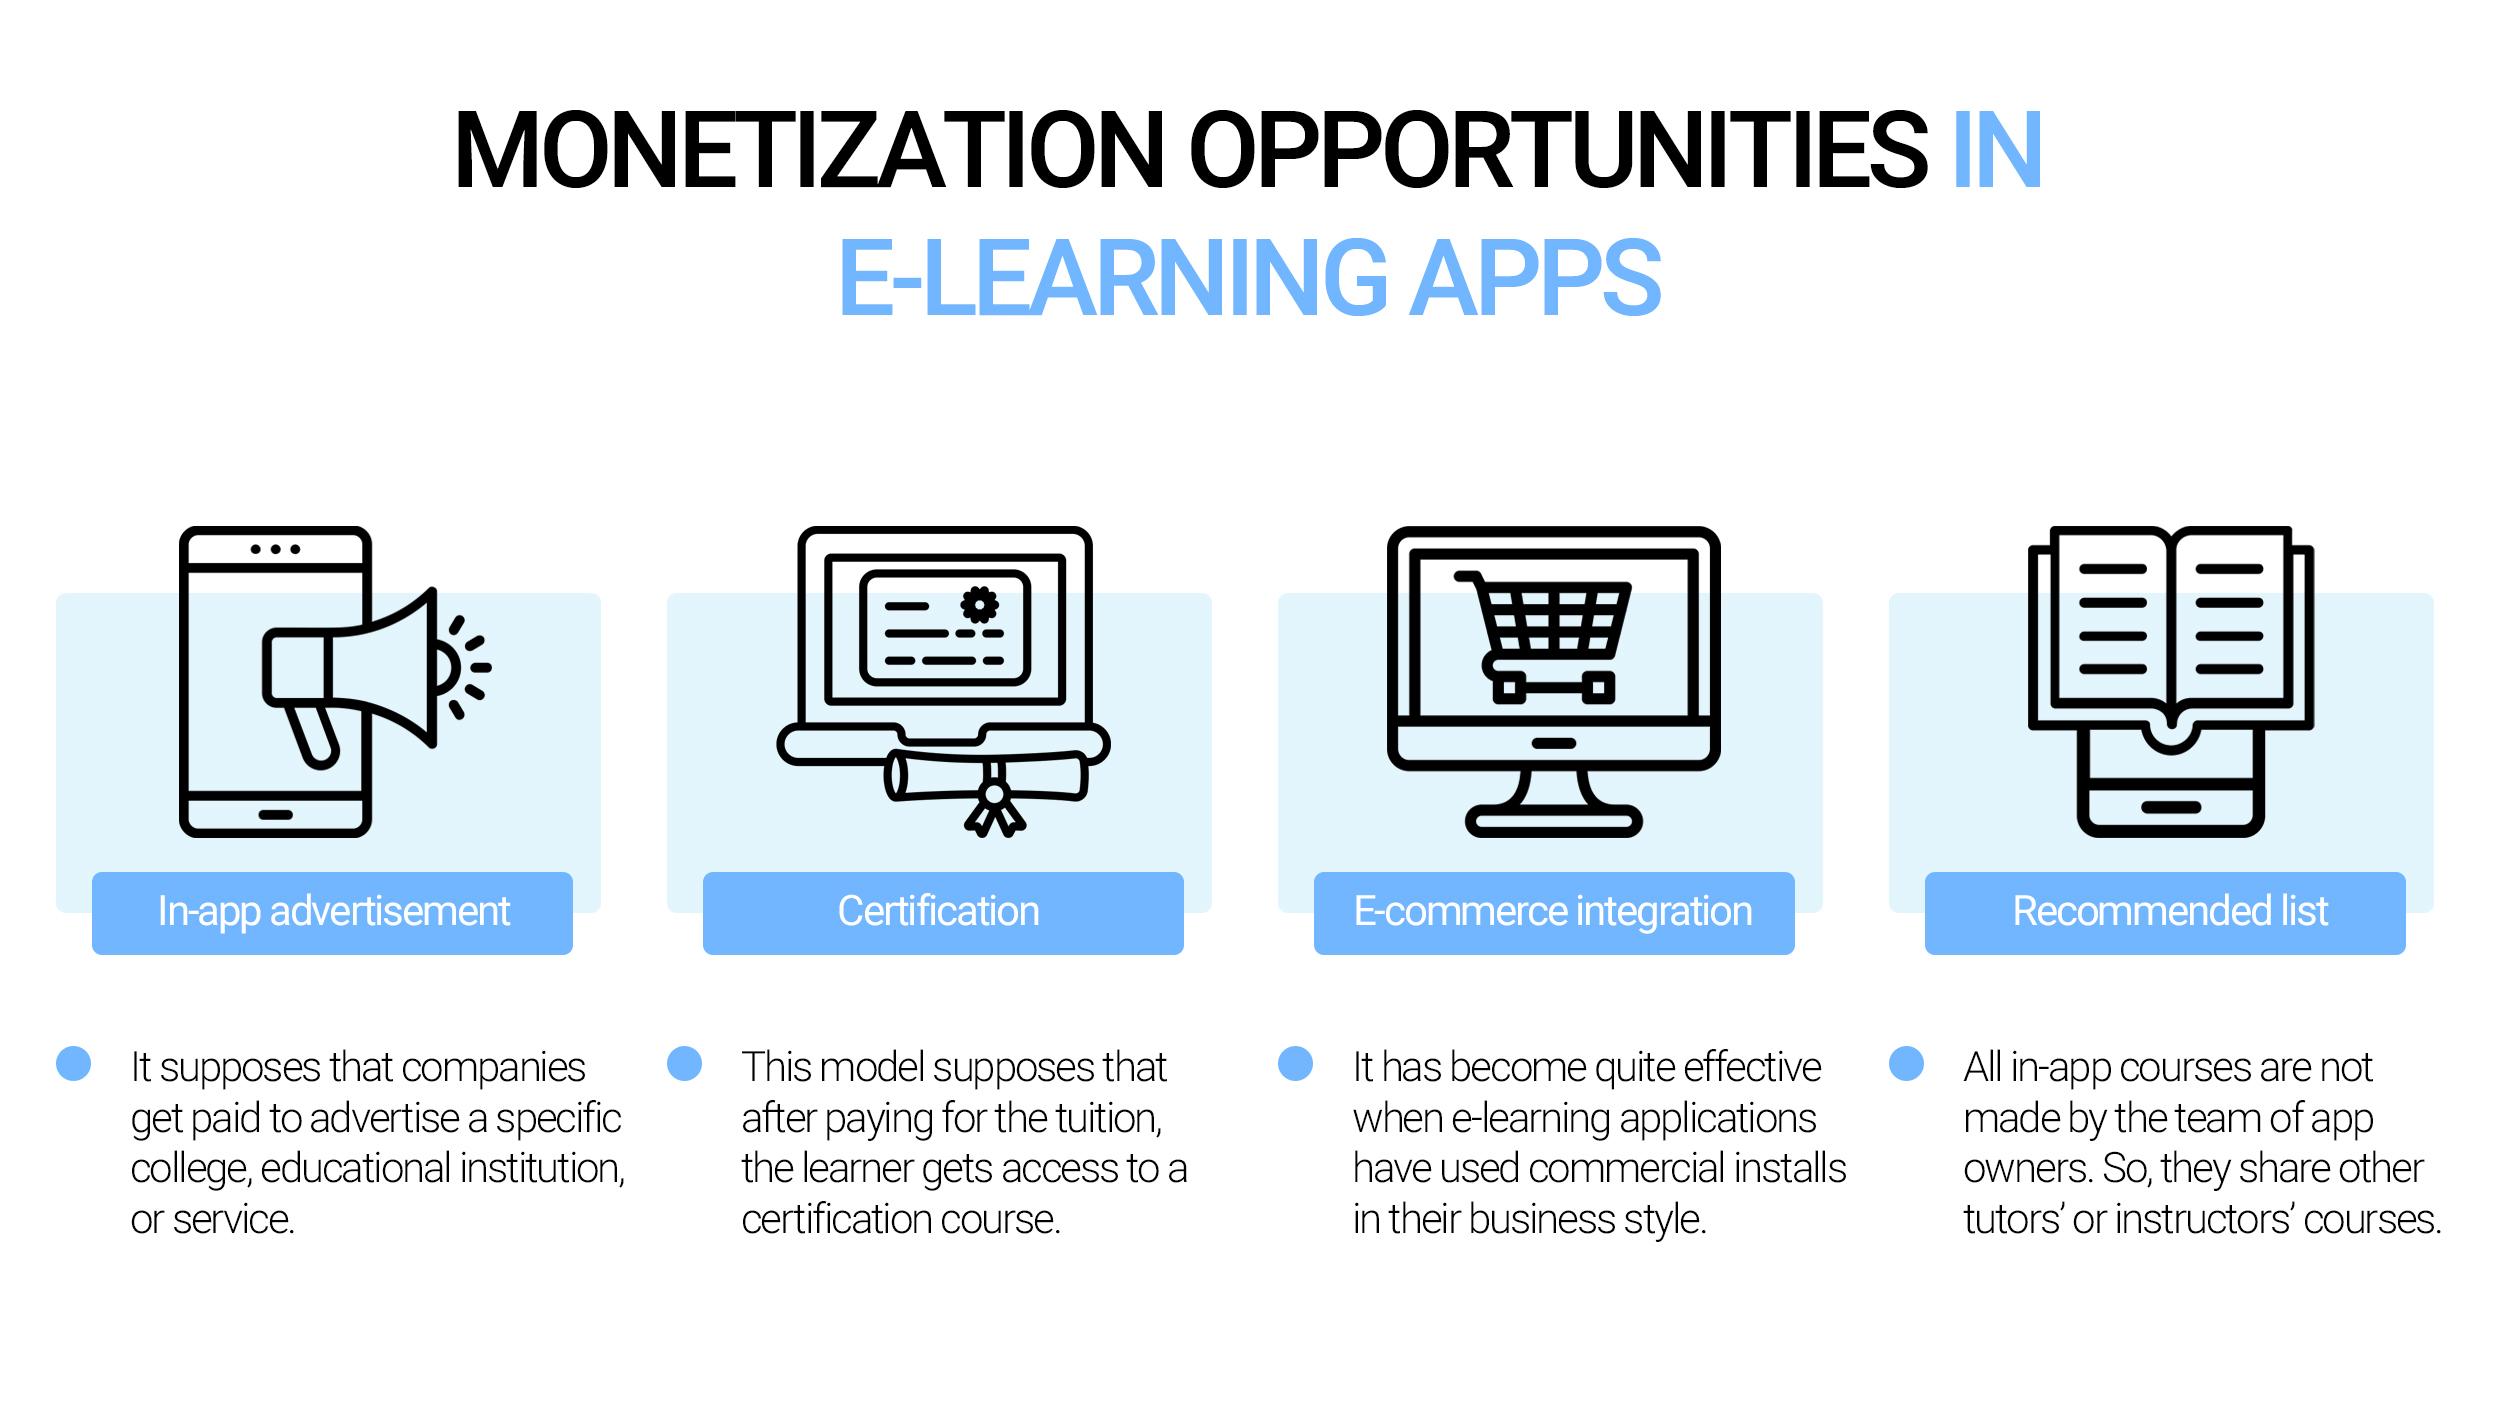 Monetization Opportunities in e-Learning Apps